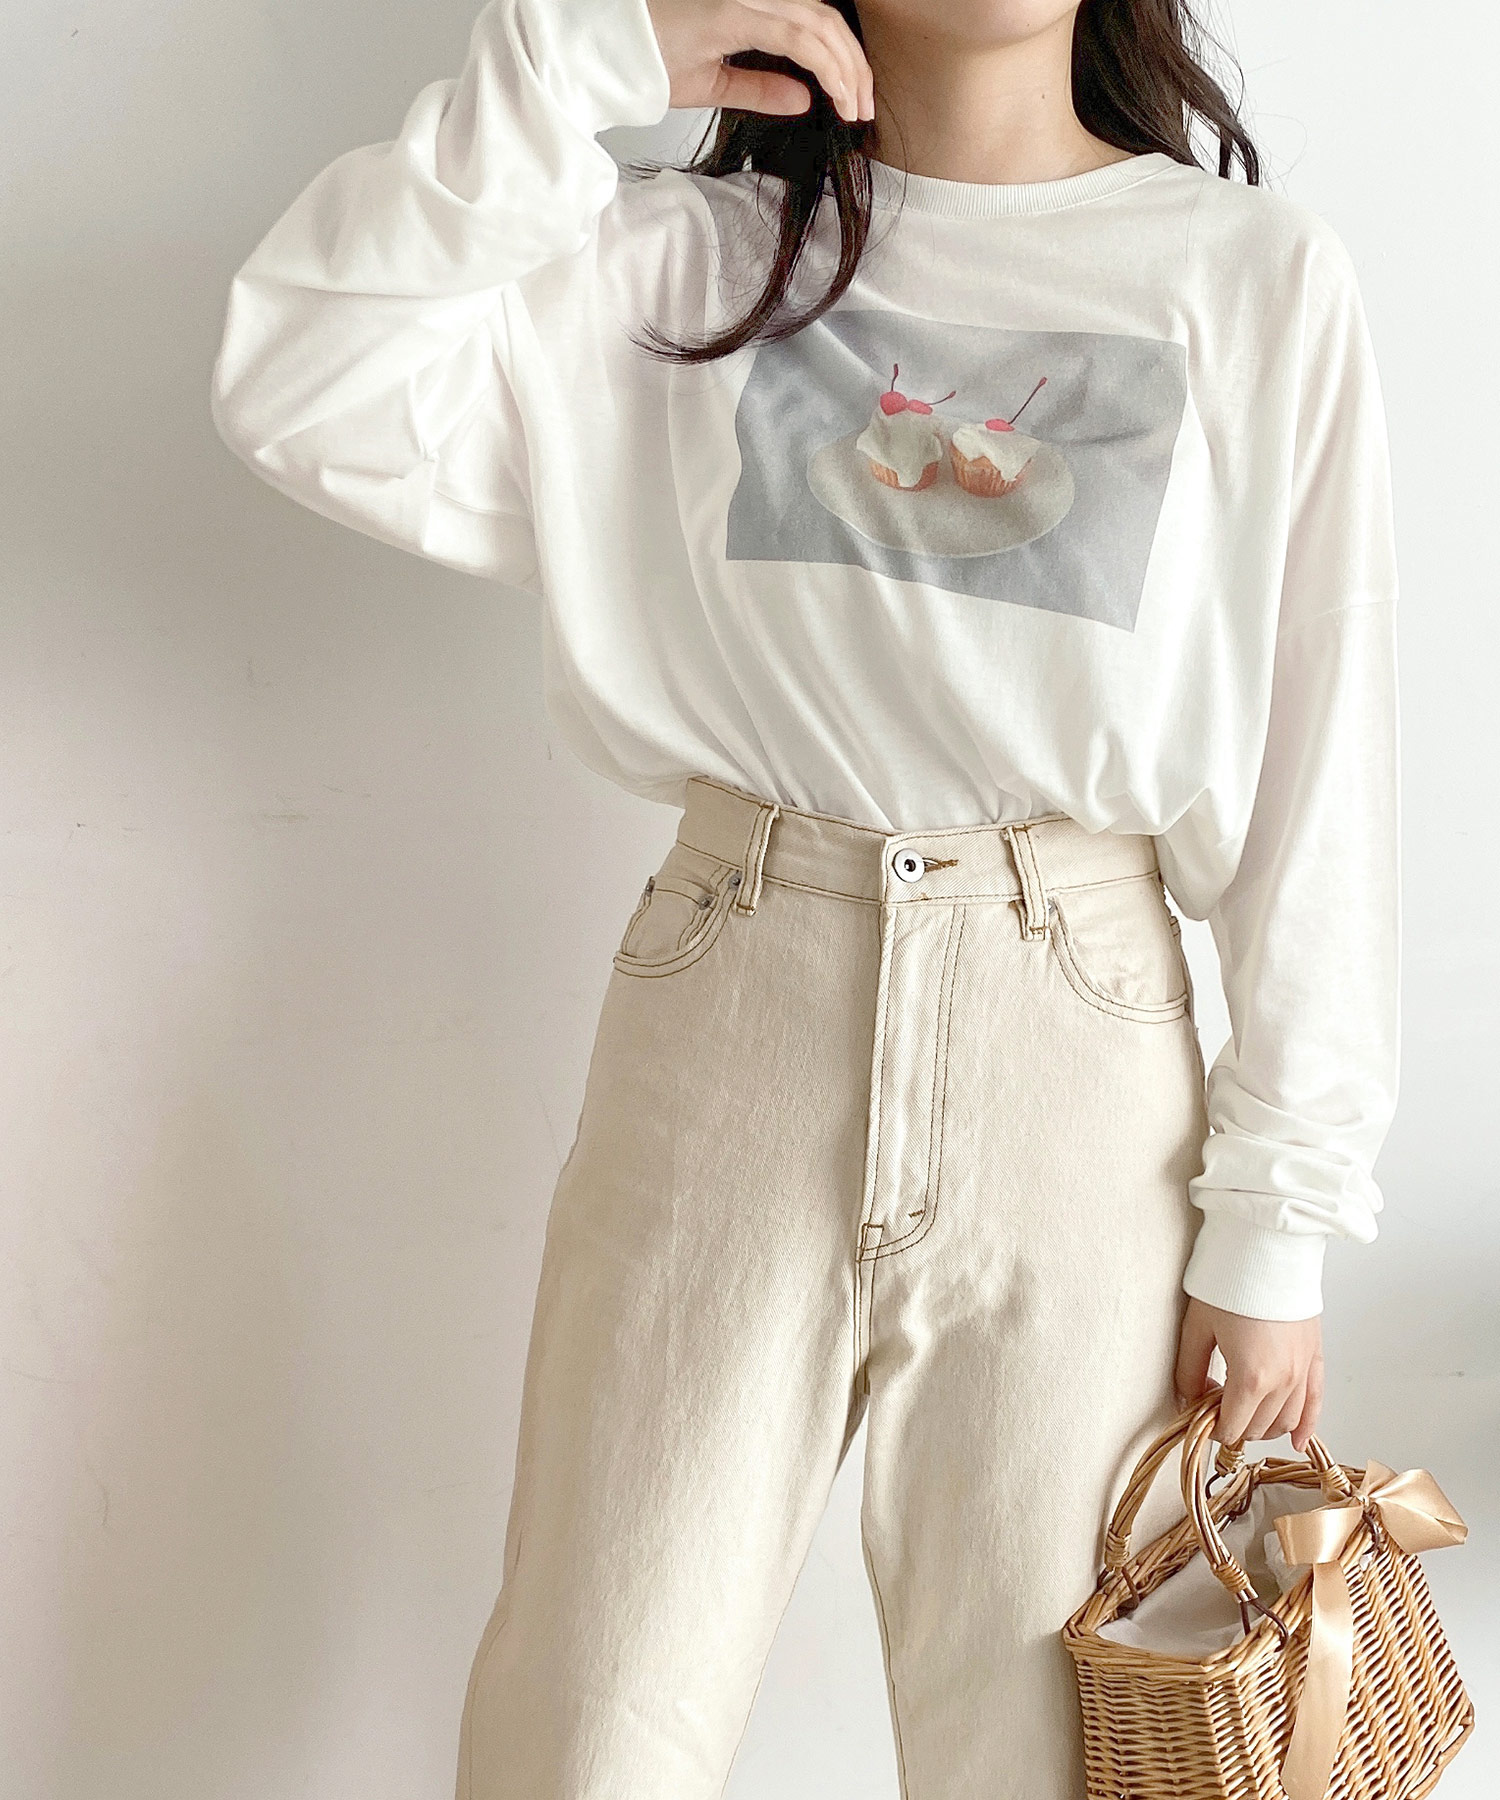 Tシャツ ロング スイーツ レシピ emuemu×mimi toujours